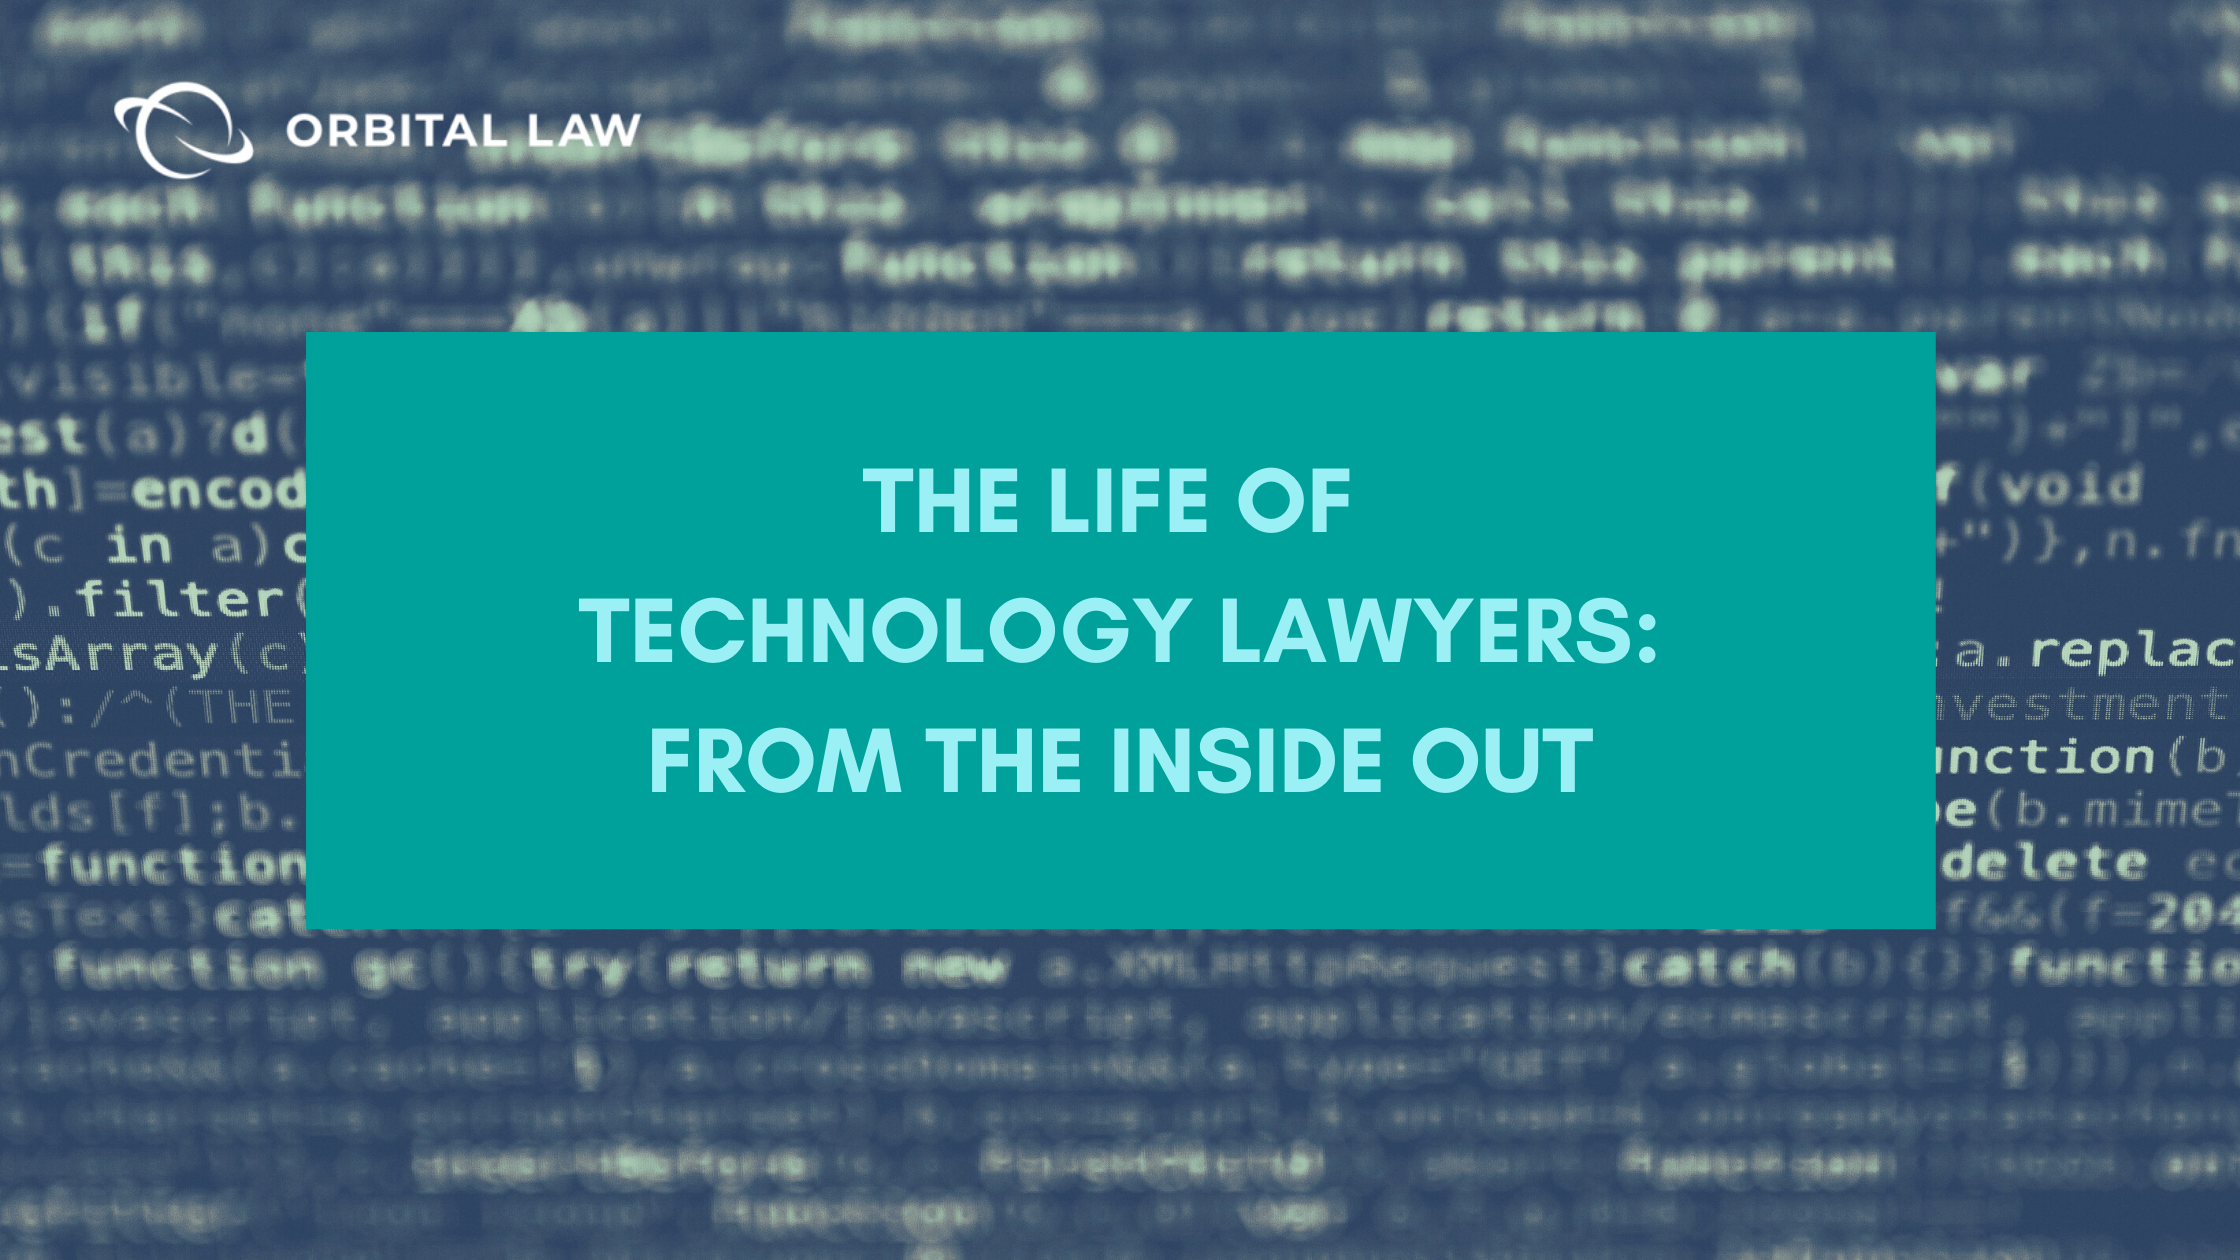 Technology lawyers blog image